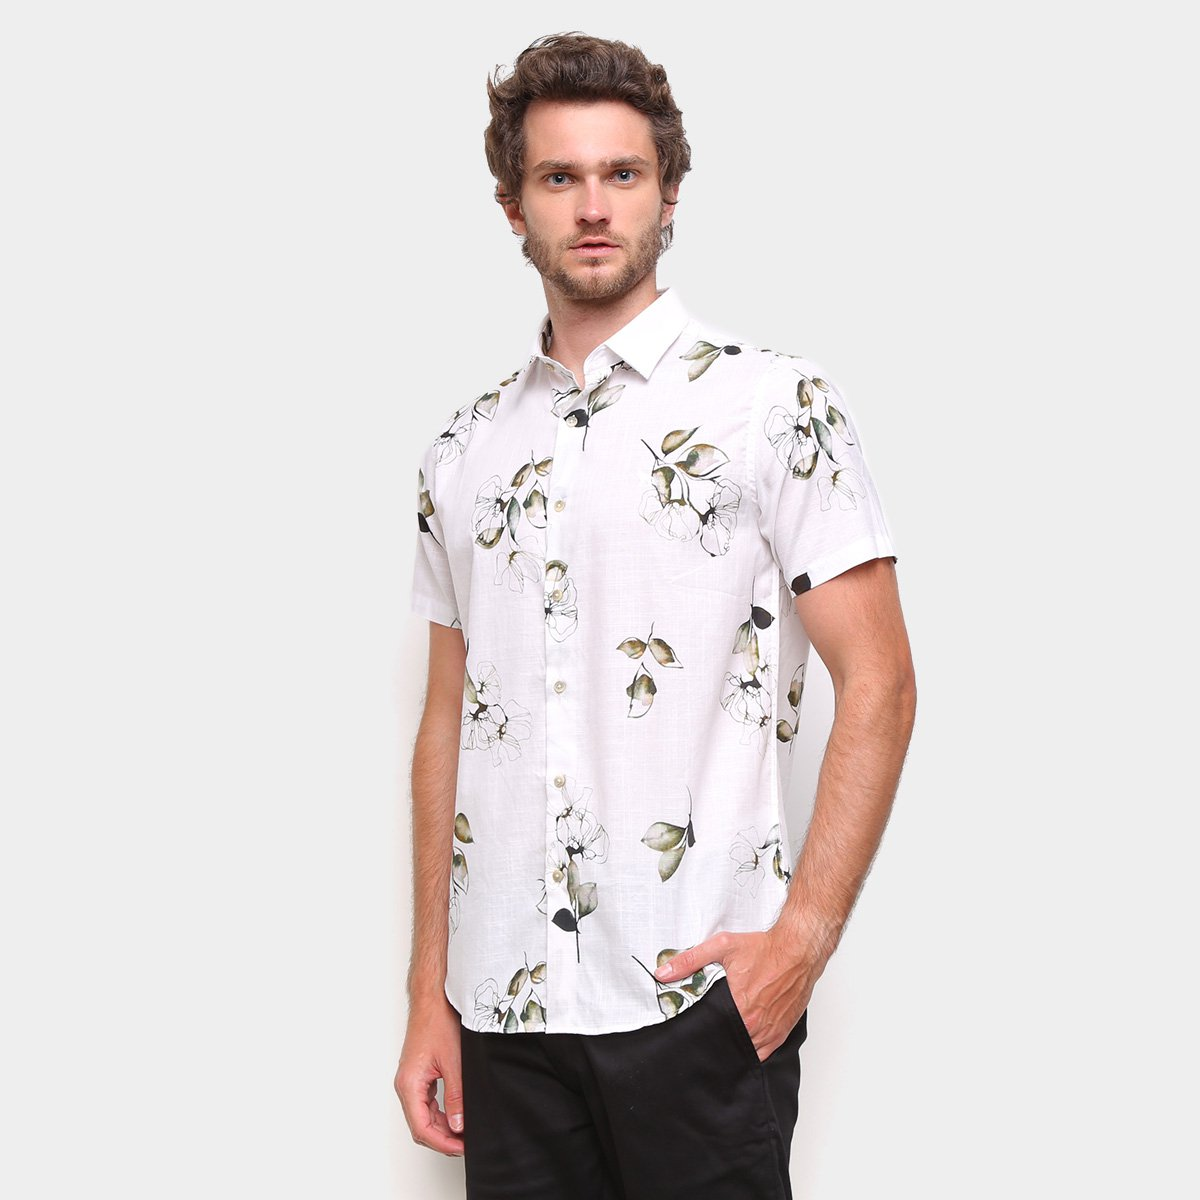 Camisa Acostamento Floral Masculina